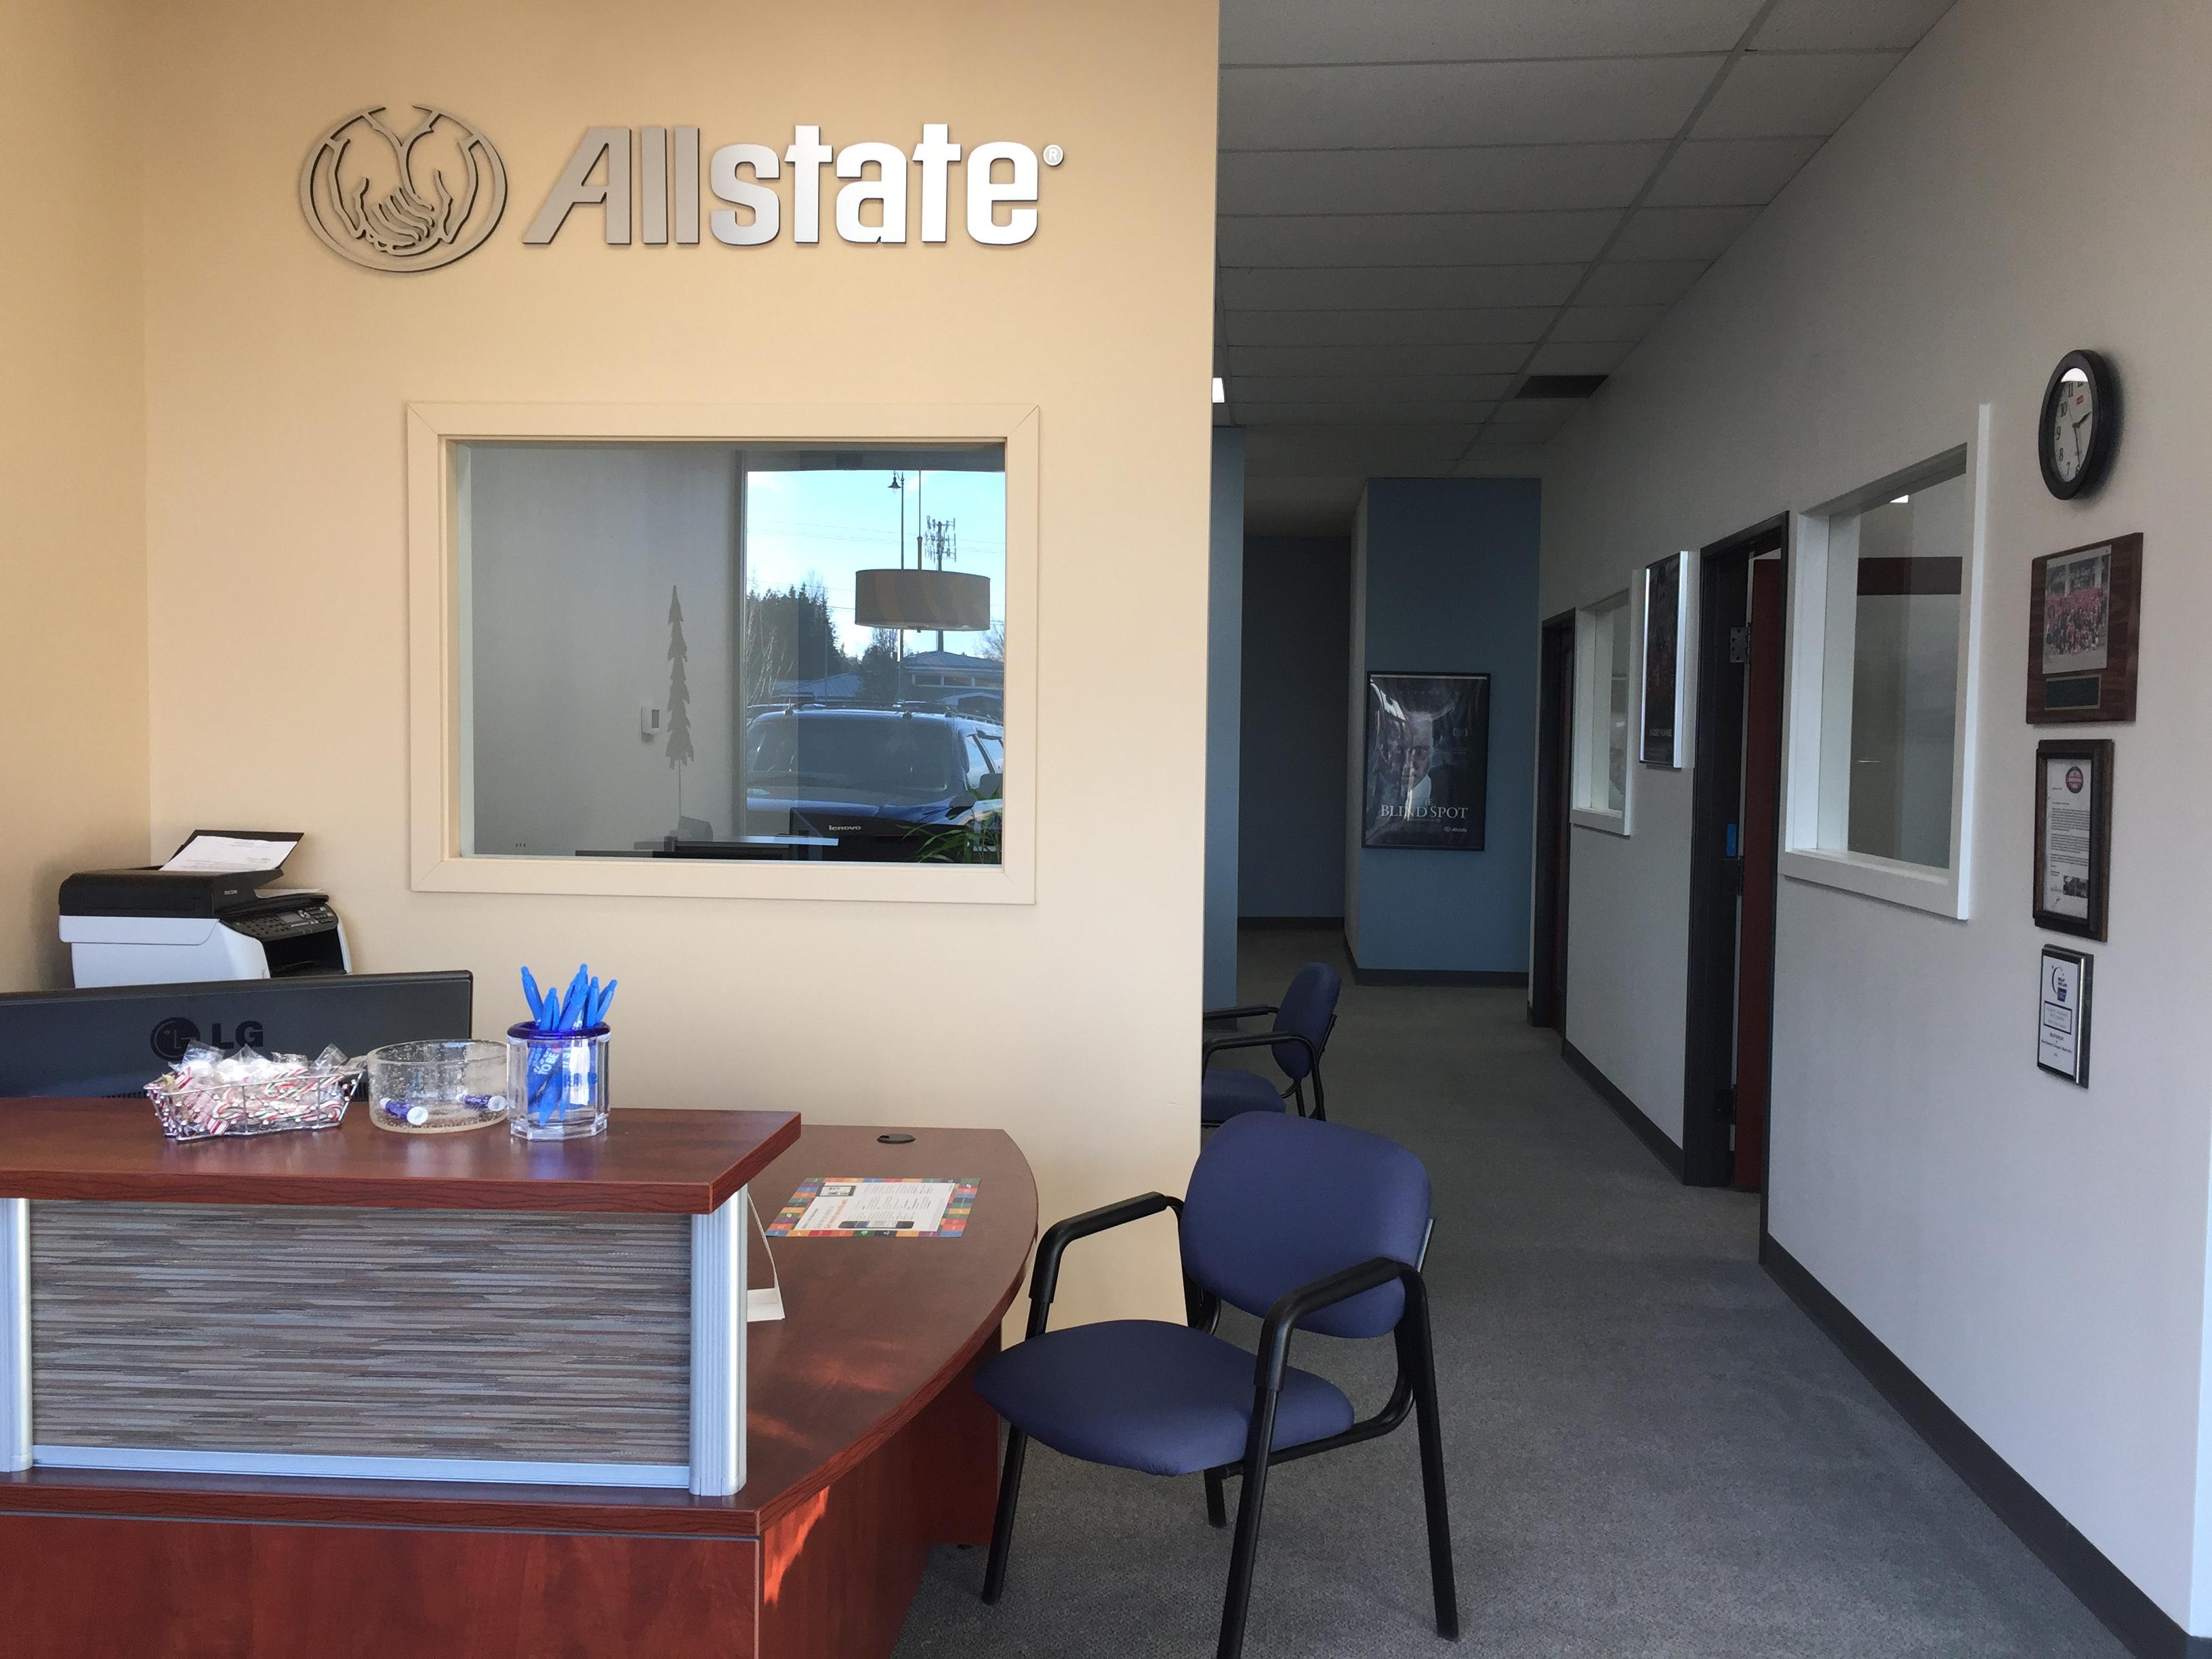 Francesca Moceri: Allstate Insurance | 23878 SE Kent Kangley Rd, Maple Valley, WA, 98038 | +1 (425) 432-1912